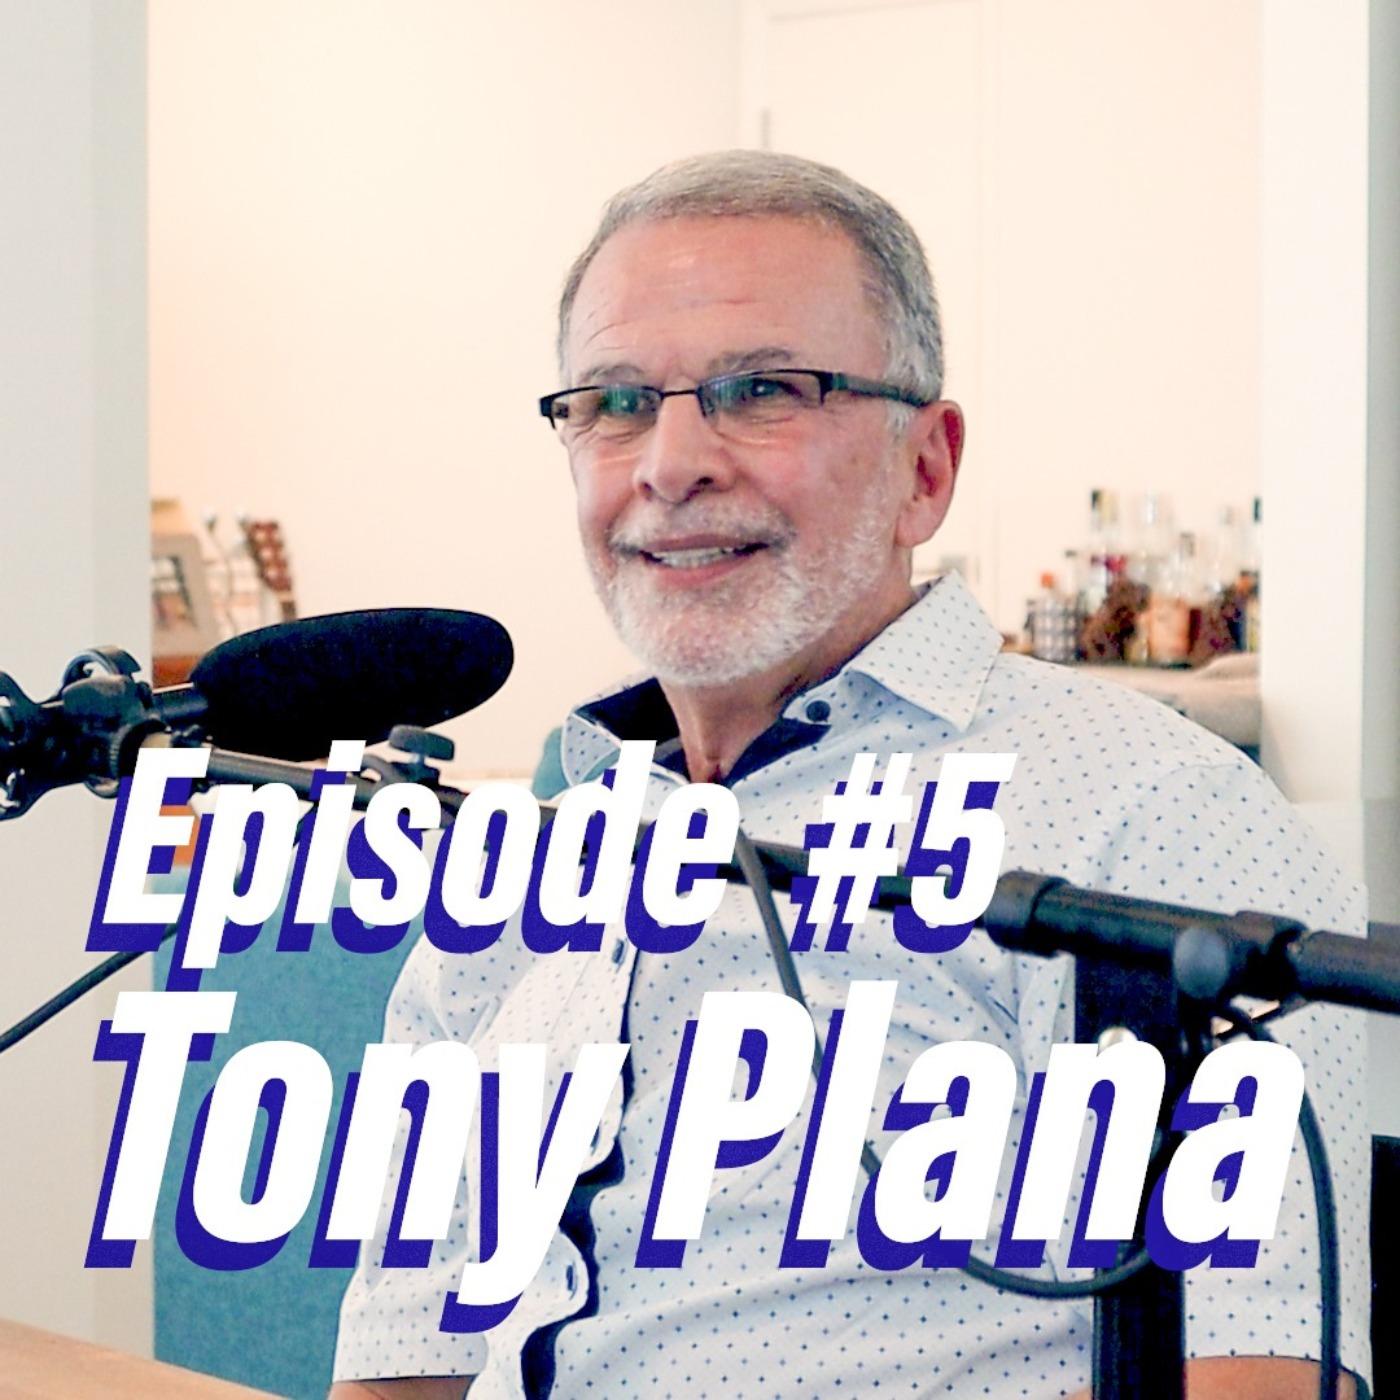 Episode #5 with Tony Plana